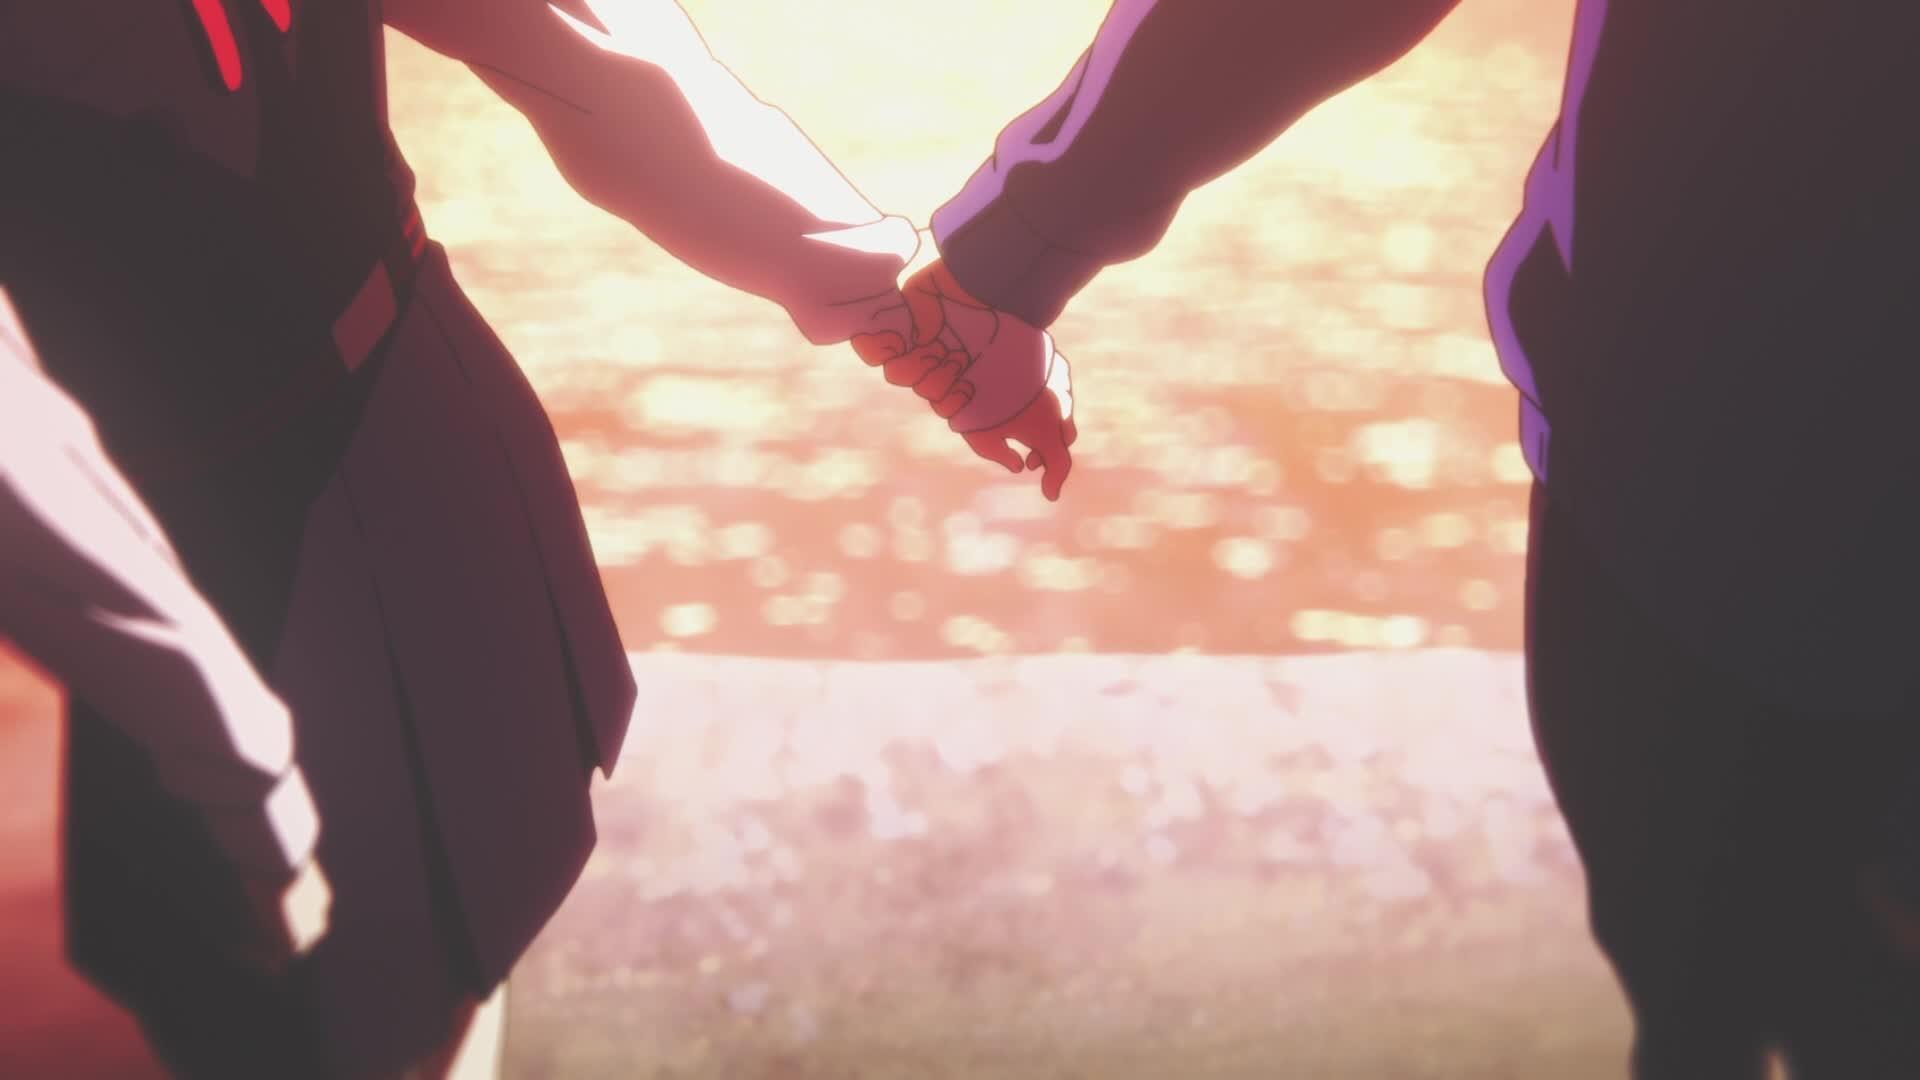 Anime 1920x1080 Tamako Market anime holding hands